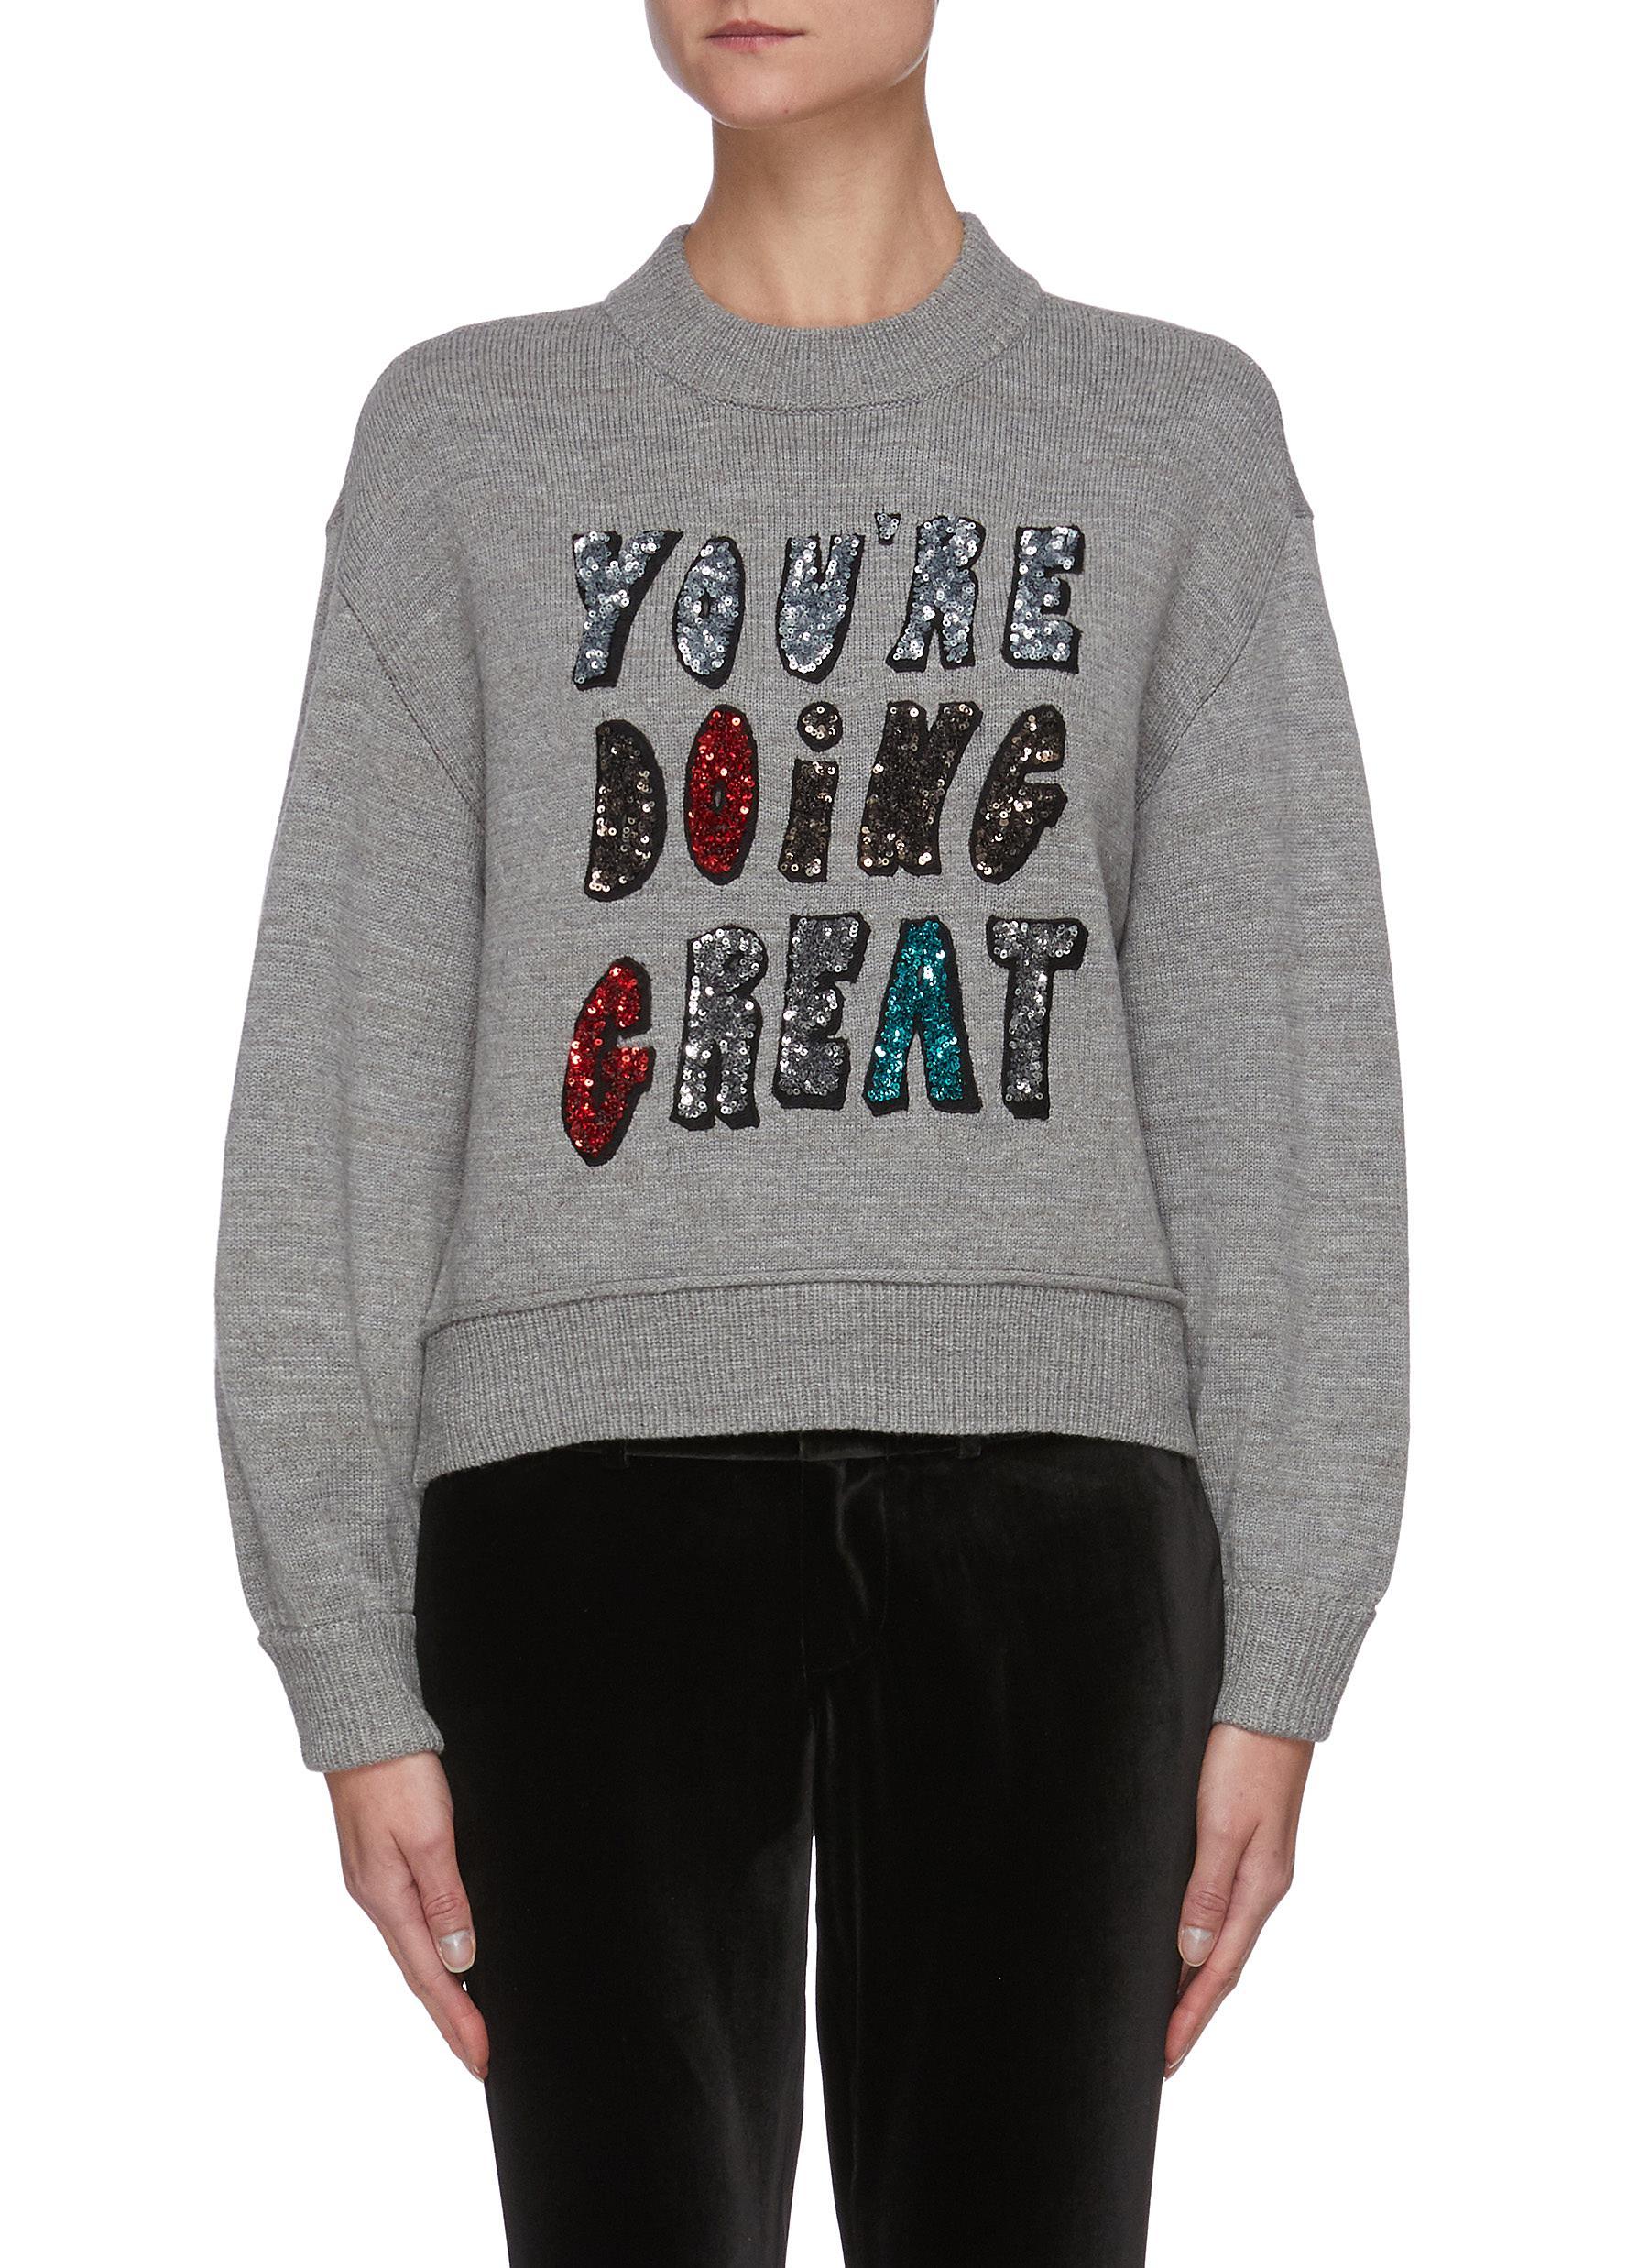 DENVER' Sequin Embellished Slogan Sweater - ALICE + OLIVIA - Modalova